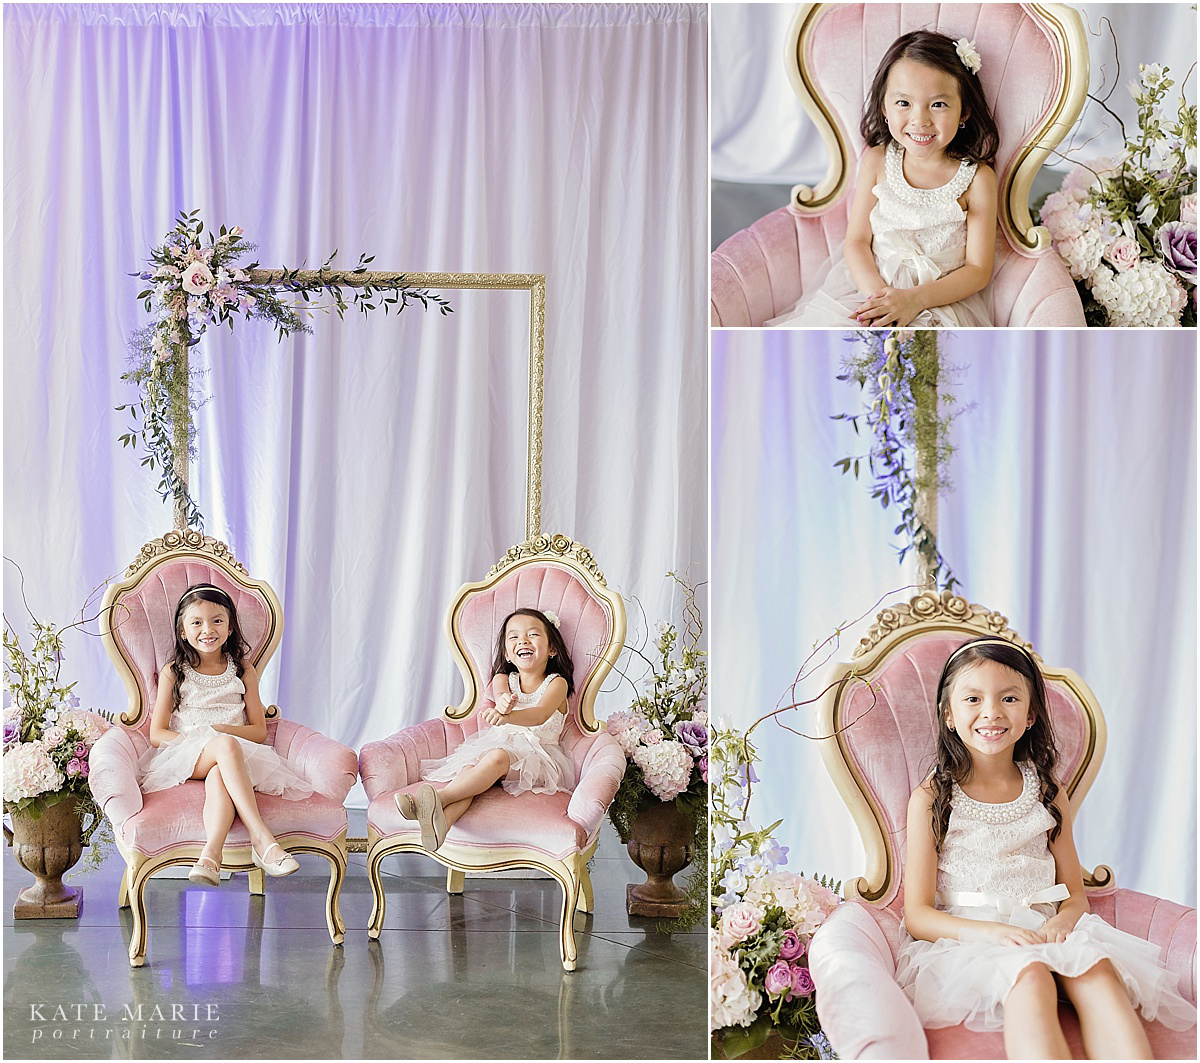 Dallas_Wedding_Photographer_Flower_Mound_Portrait_Photographer_Kate_Marie_Portraiture_Uyen&Gordon_GaylordTexan_9.jpg